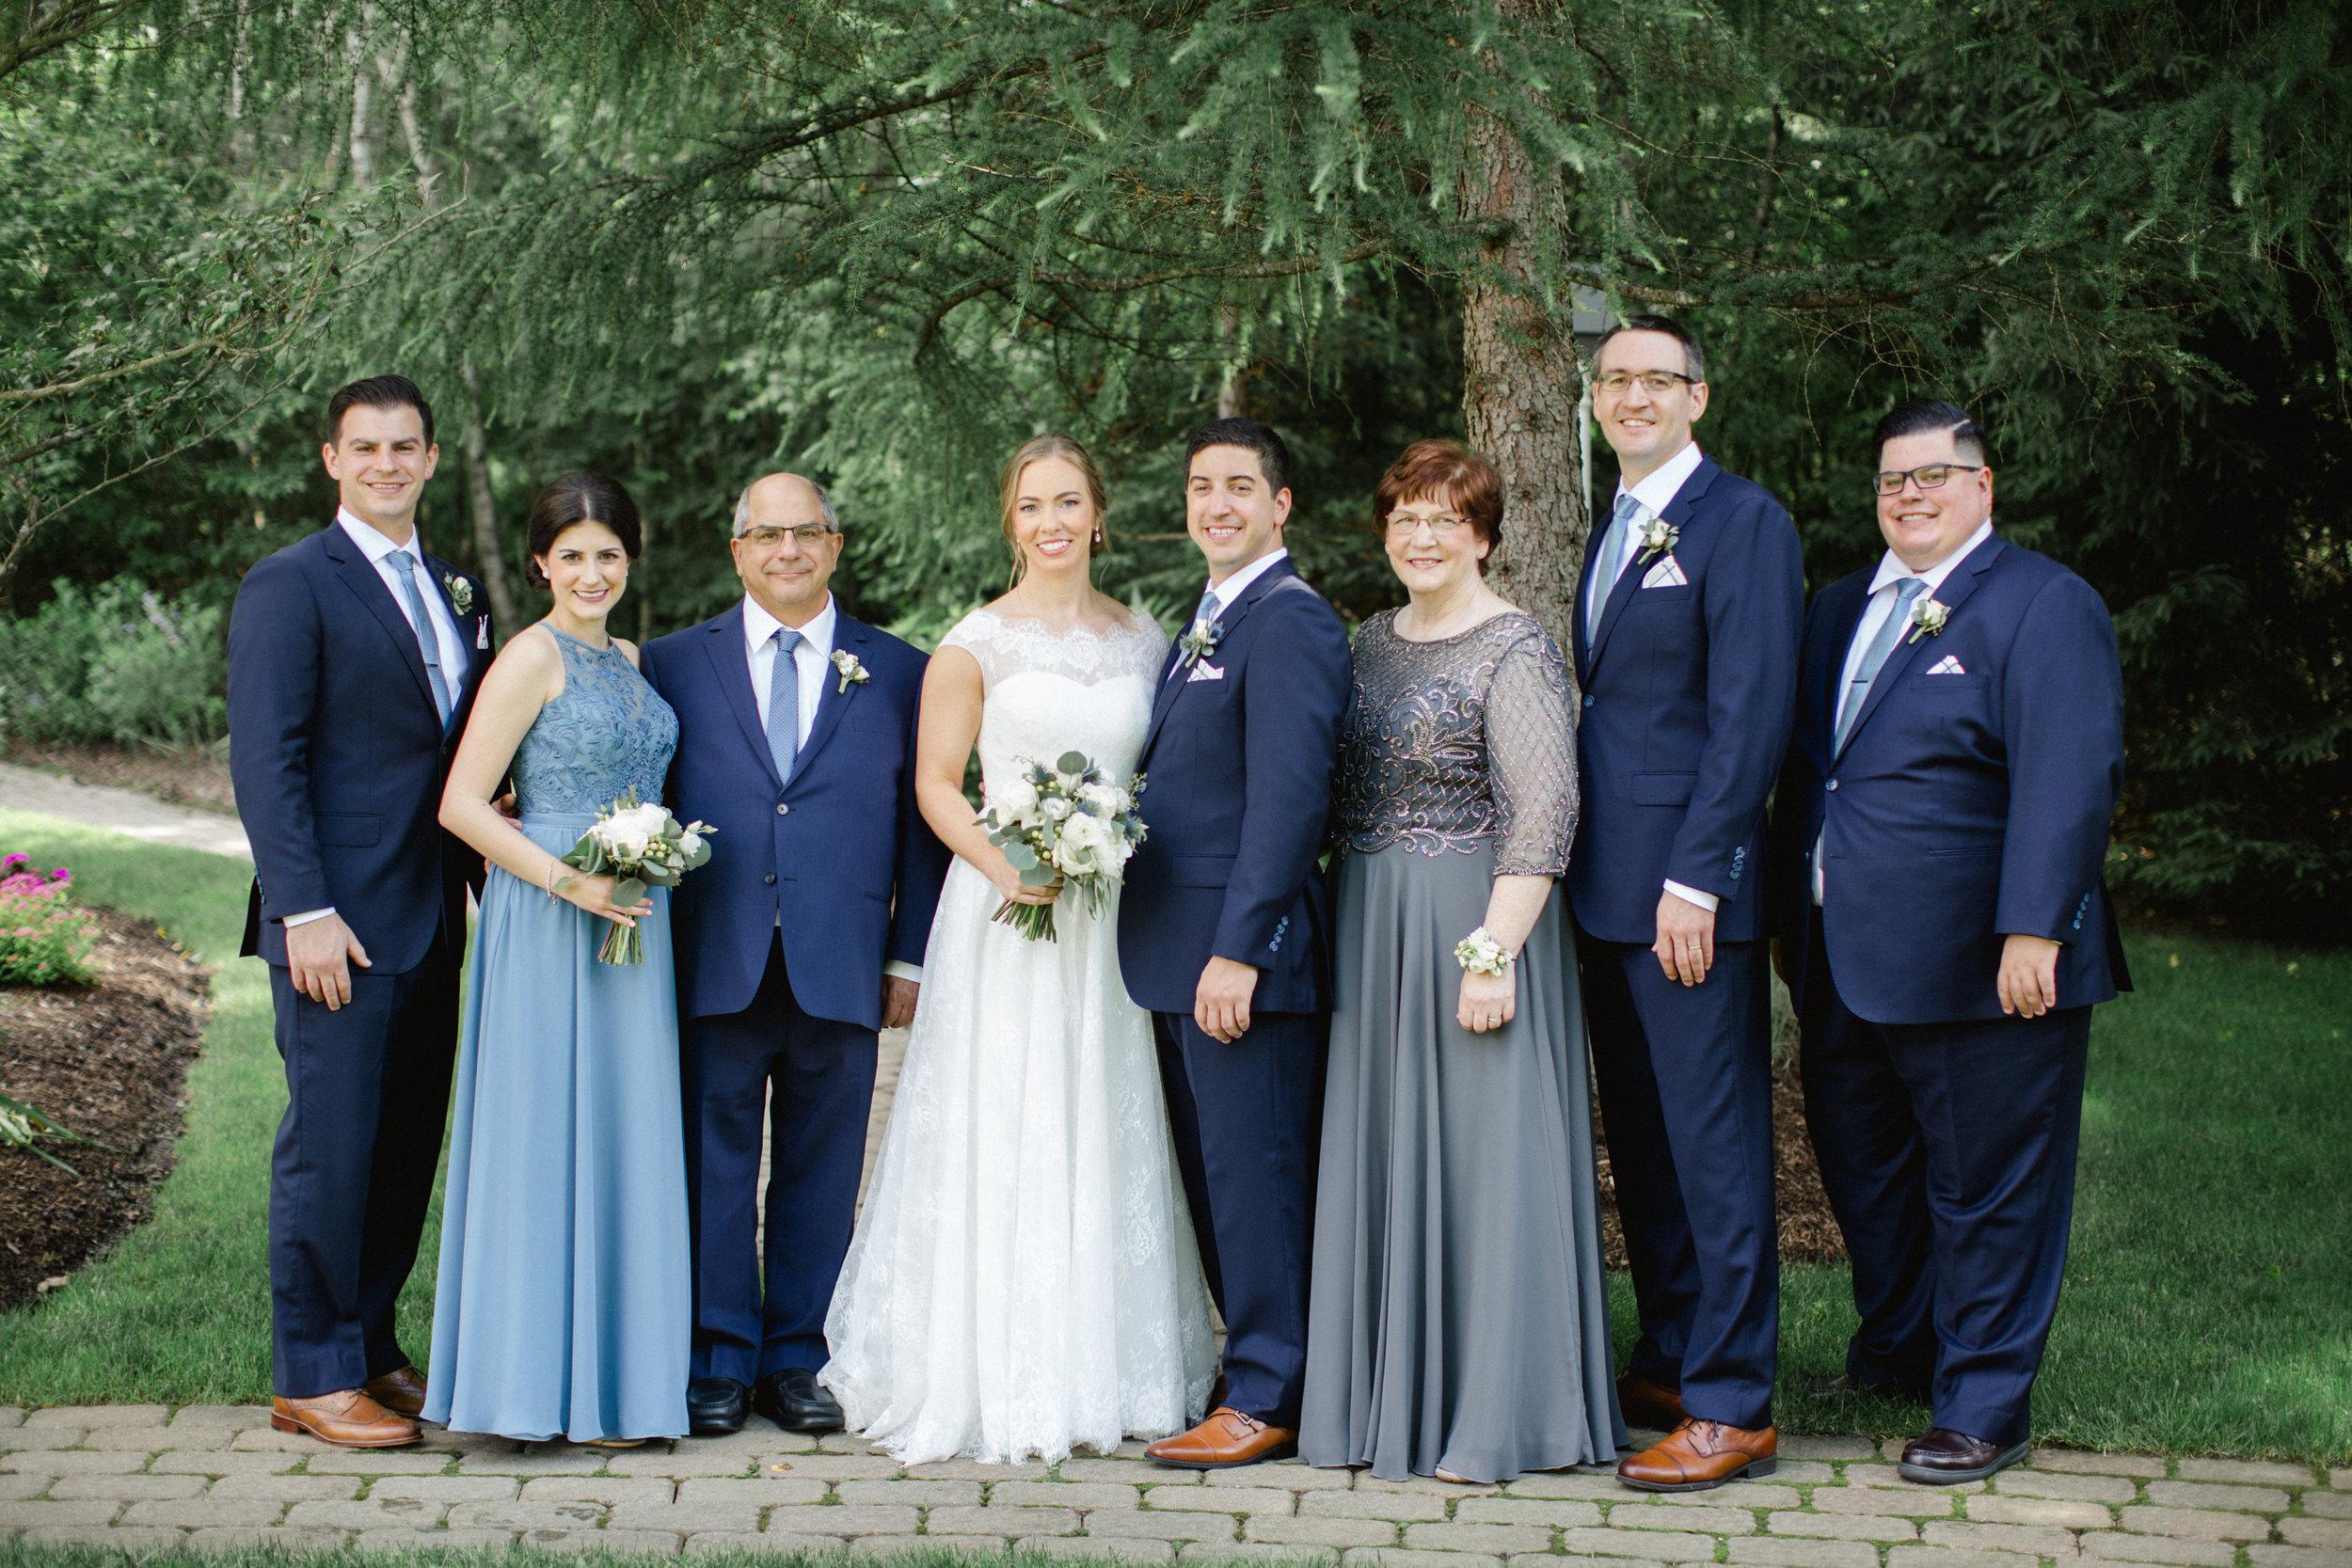 Constantino's Catering Event Venue Wedding Photos-122.jpg